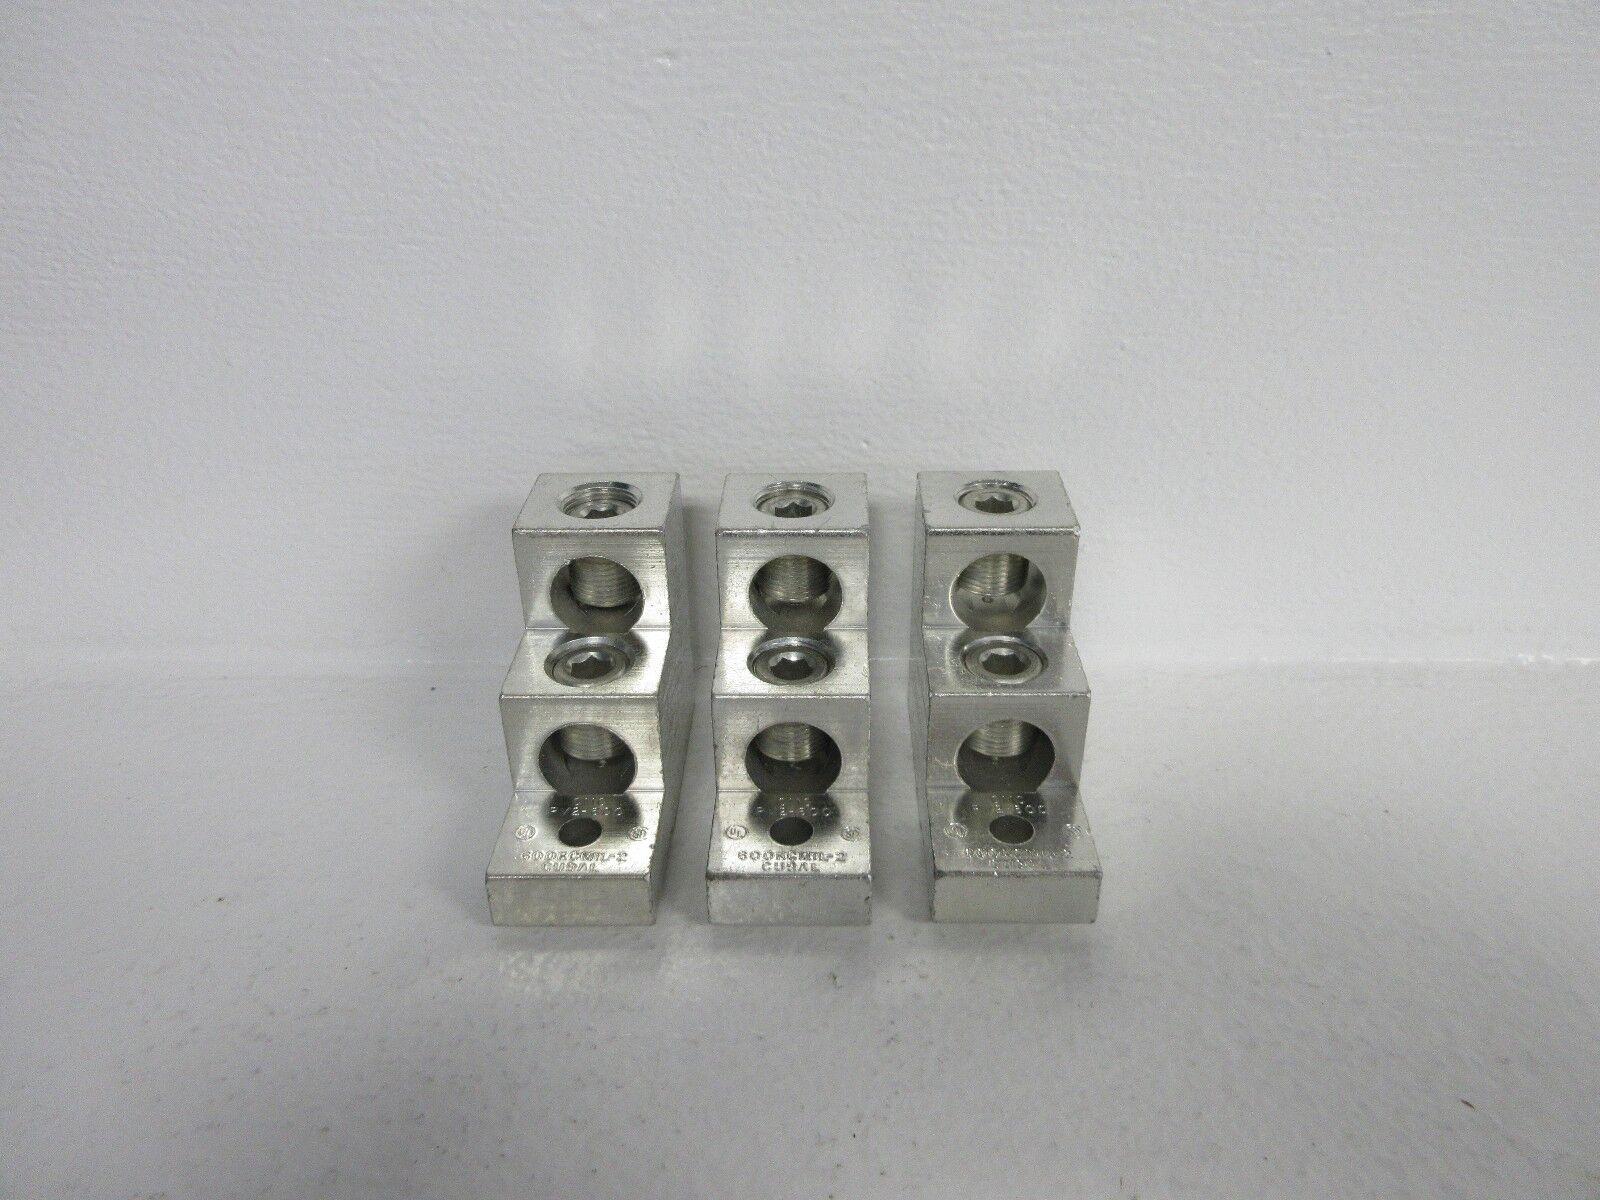 LOT OF 3 CMC PV2-600 NEW-NO BOX ALUMINUM LUGS 600KCMIL-2 PV2600